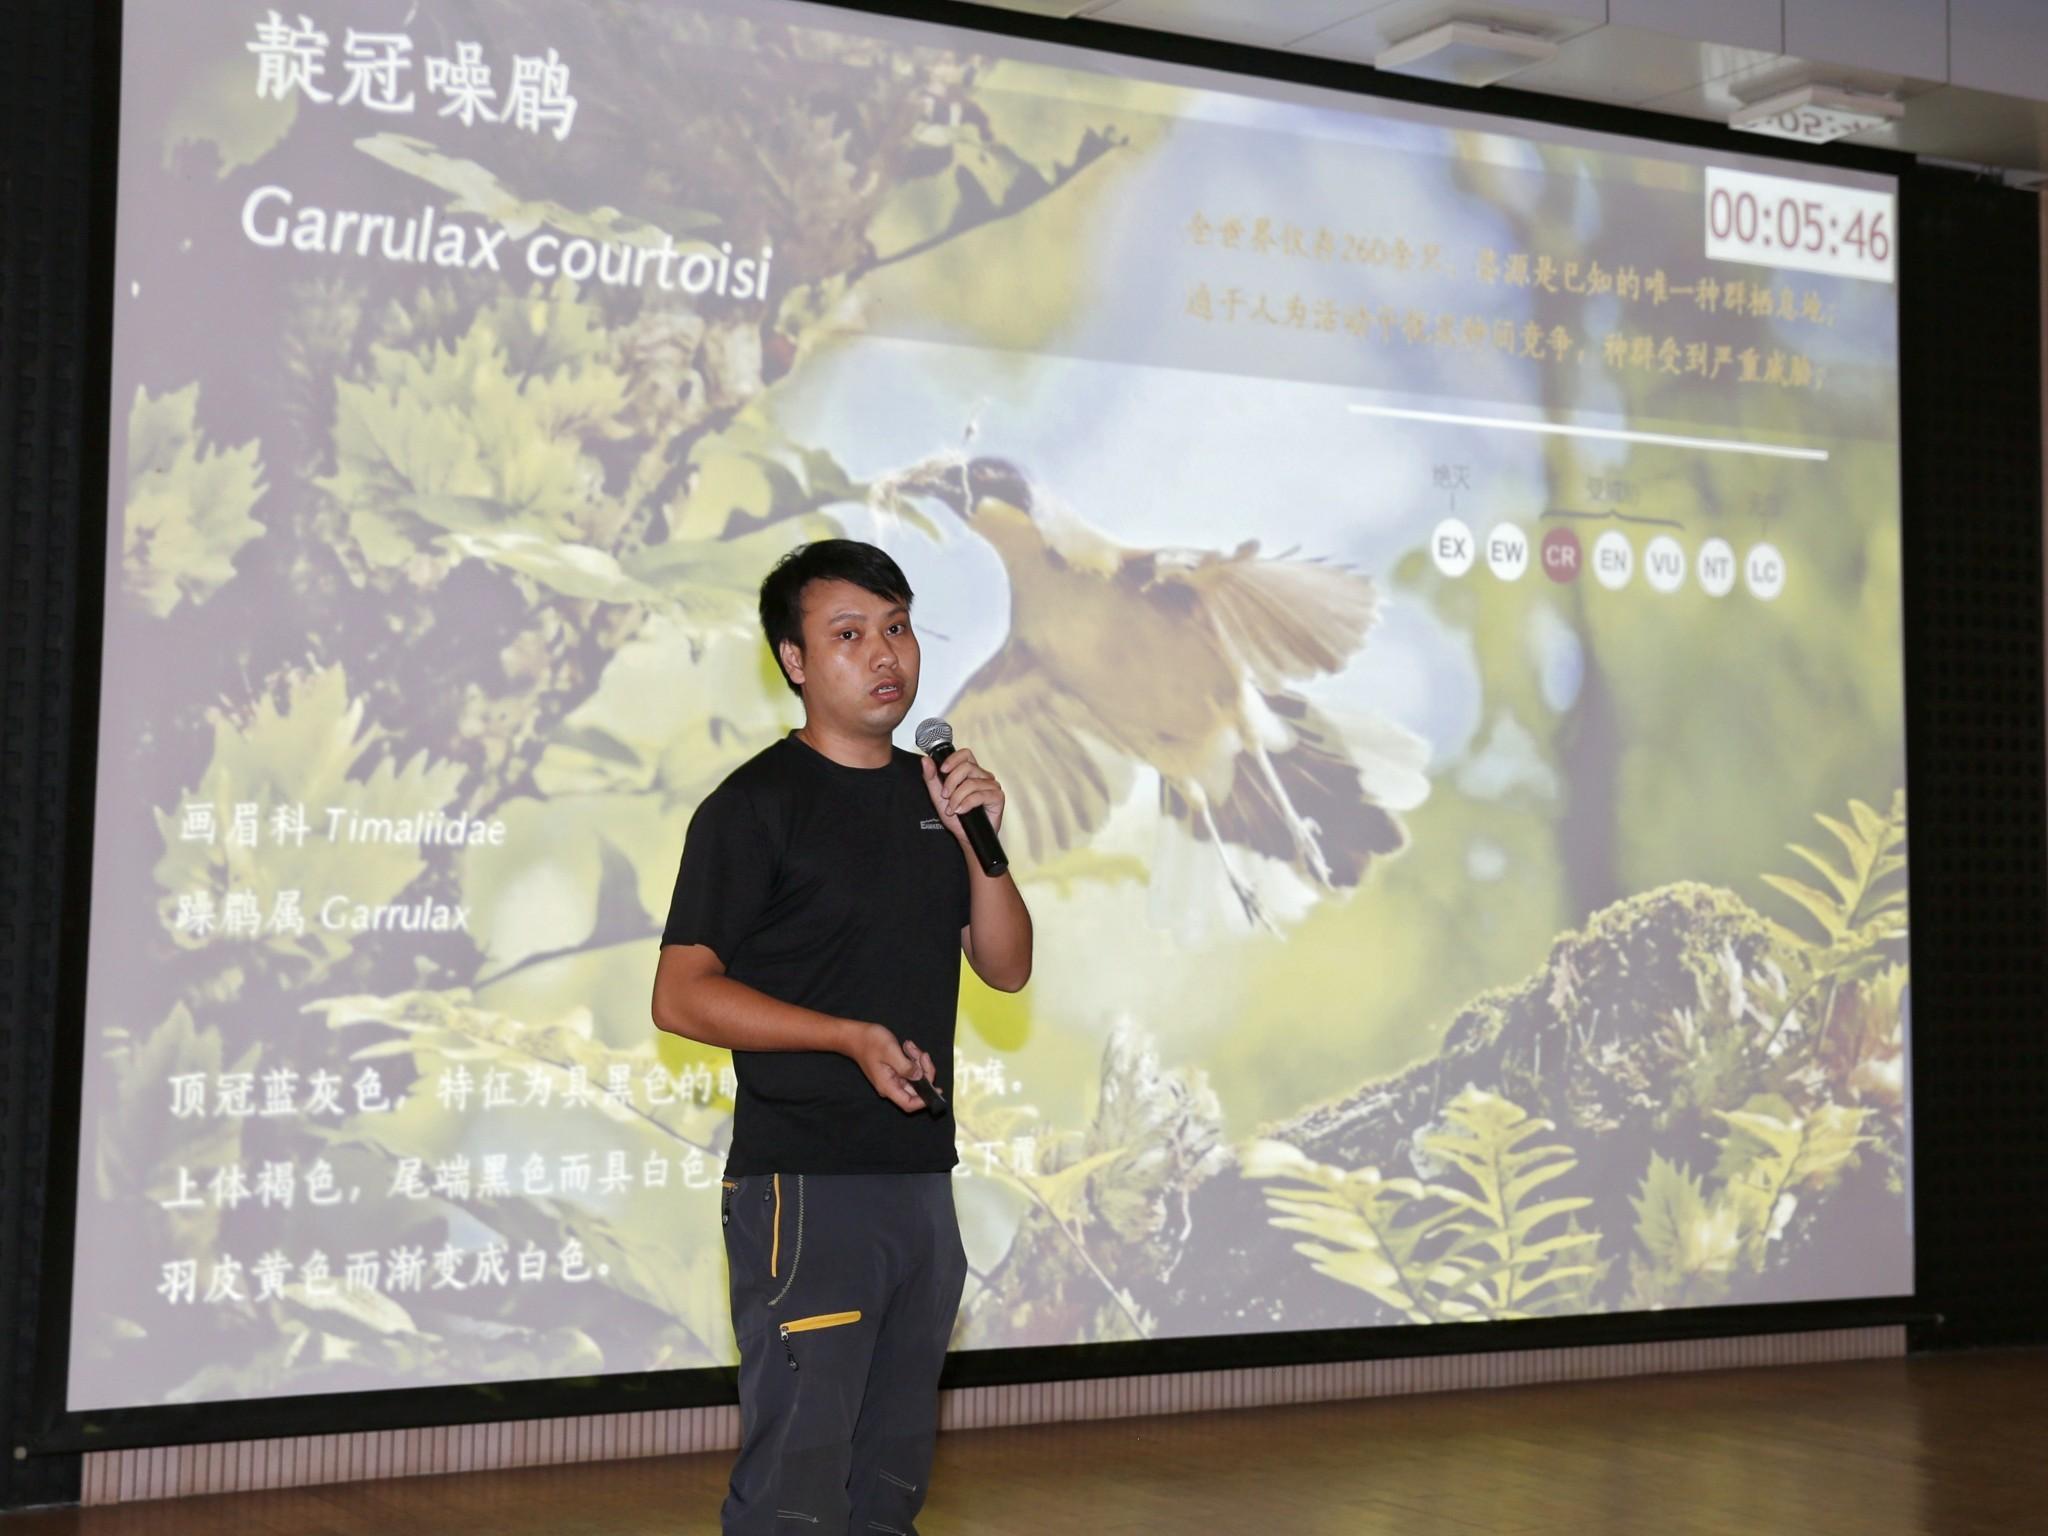 【Pecha kucha】婺源林奈实验室科技有限公司 刘芝龙:从零起步的自然实验室